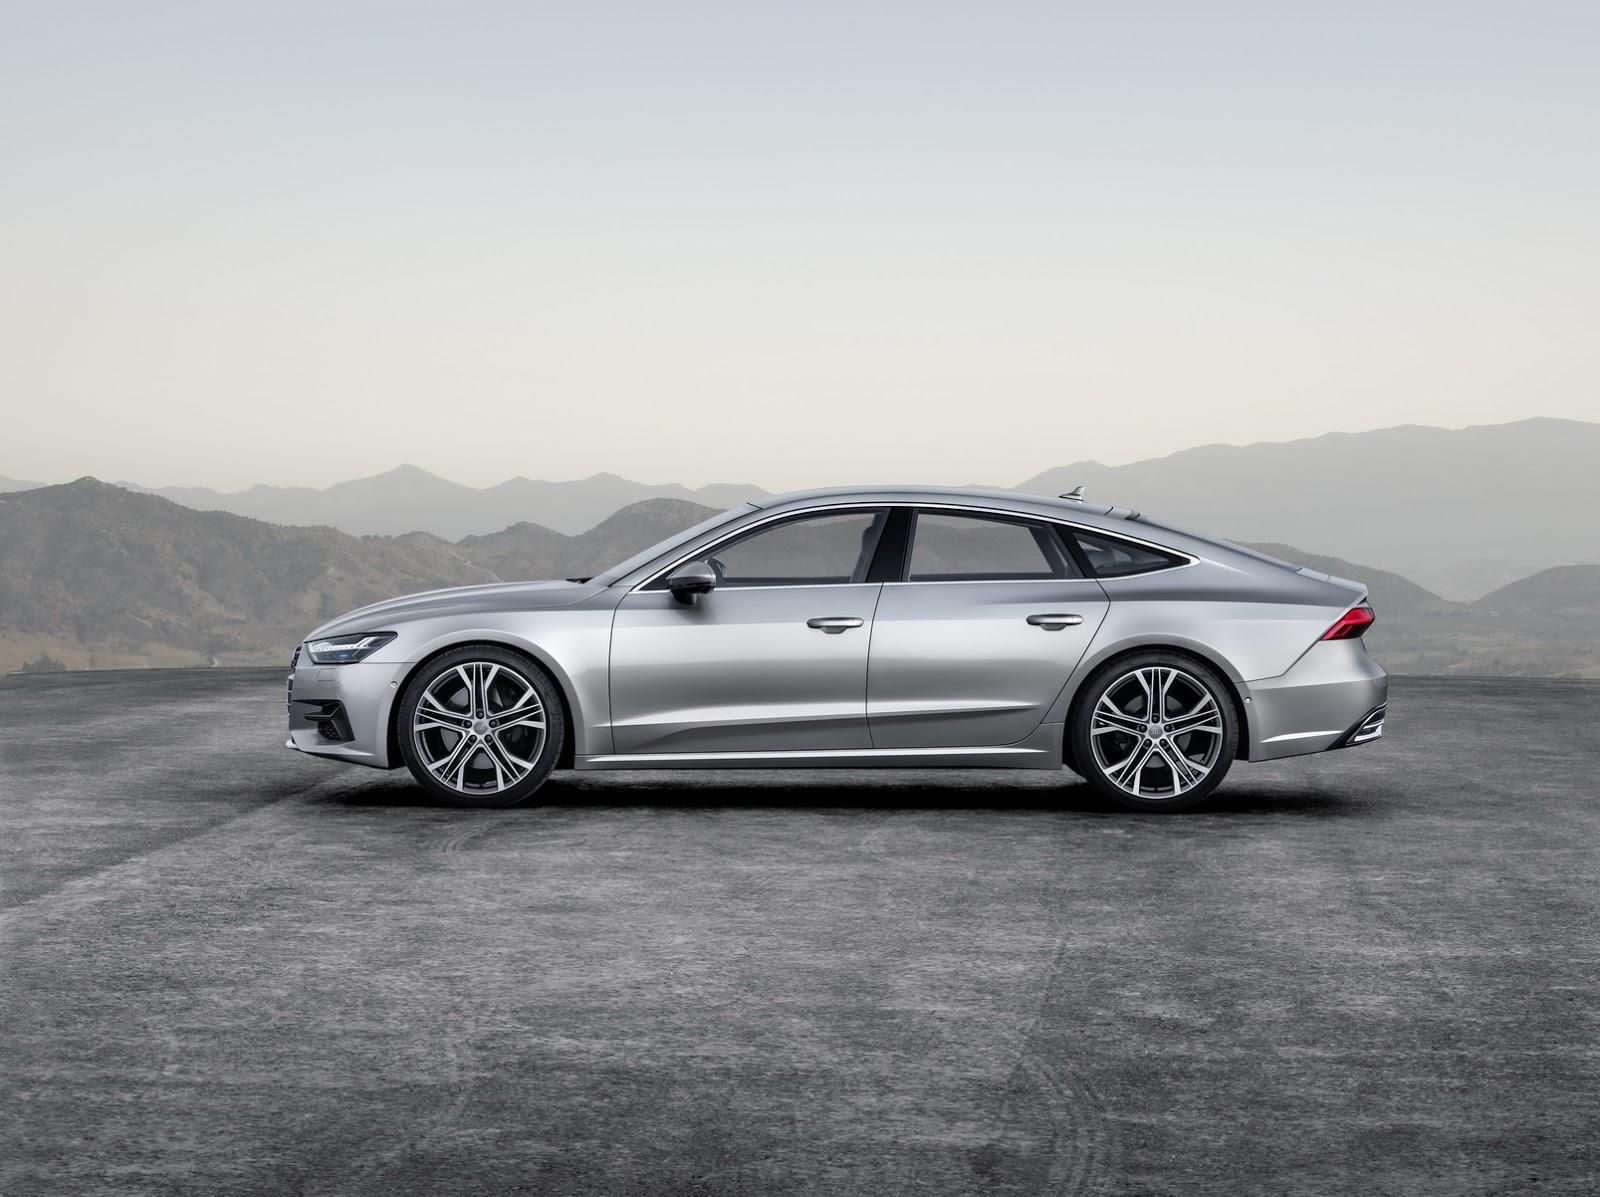 2018_Audi_A7_Sportback_0011